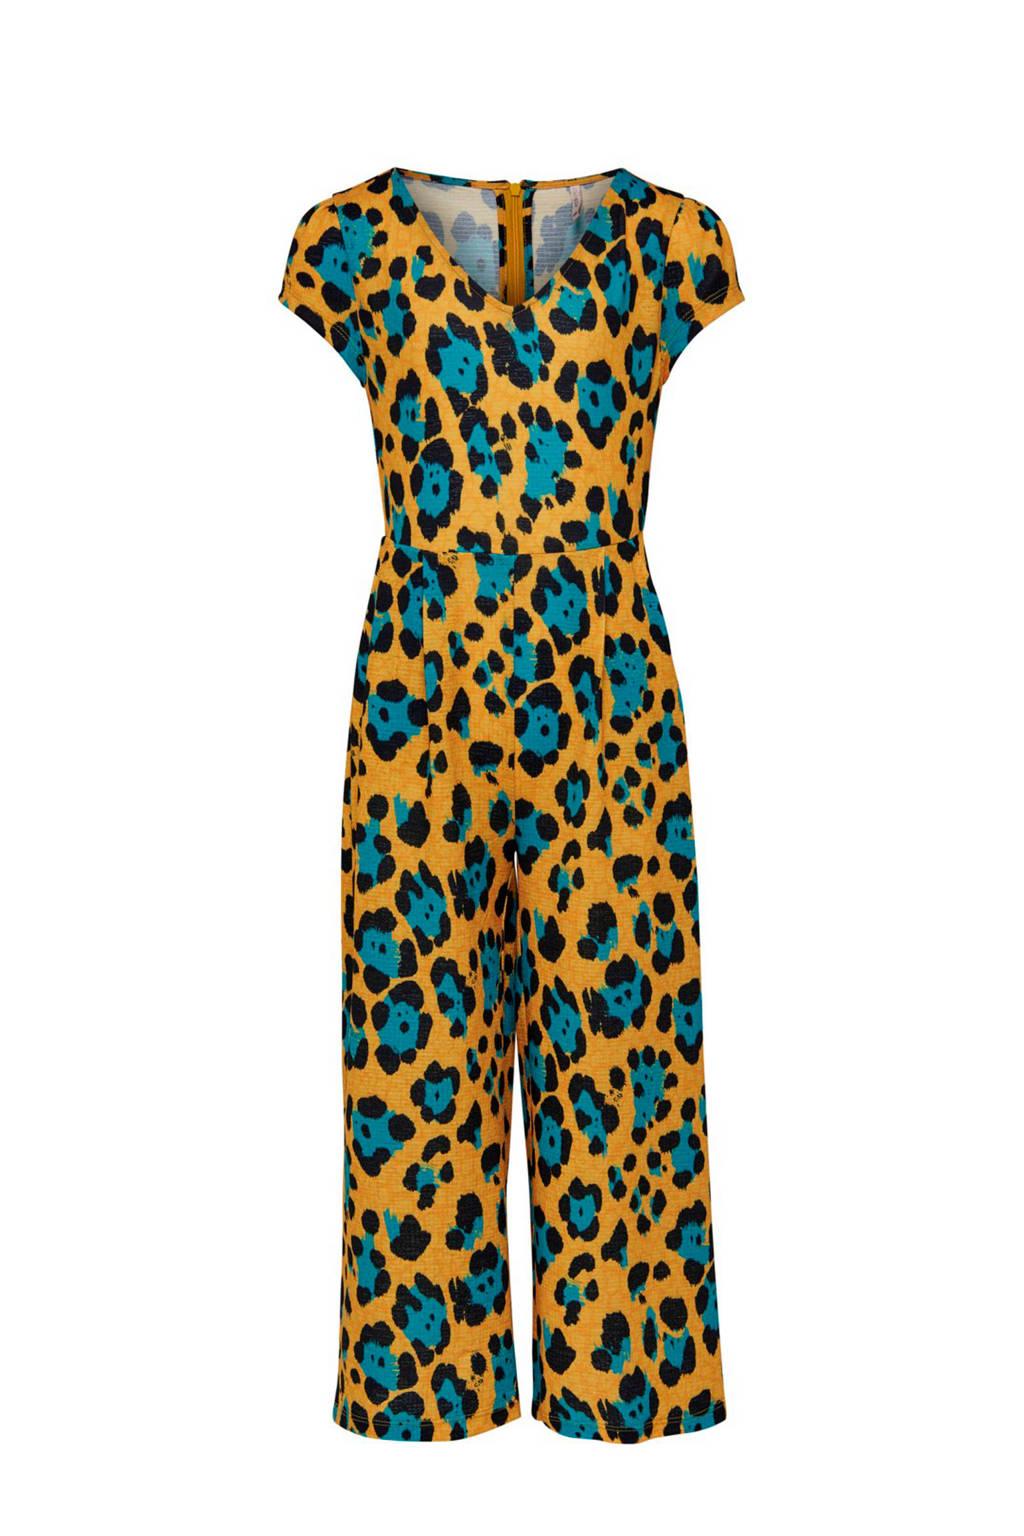 KIDSONLY jumpsuit Julia oker/turquoise/zwart, Oker/turquoise/zwart